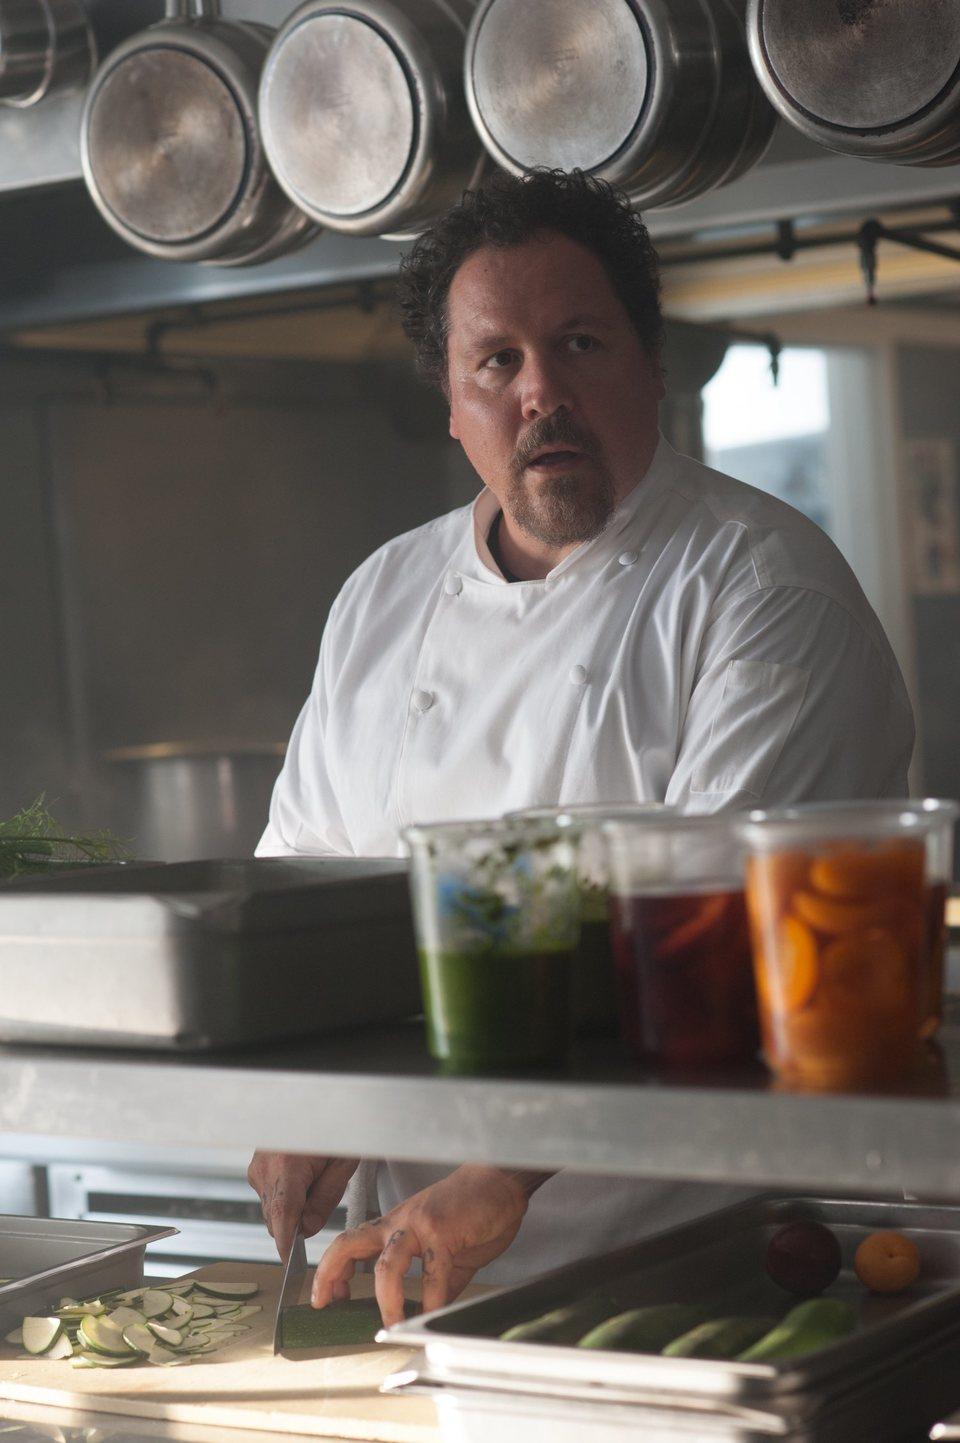 #Chef, fotograma 7 de 18